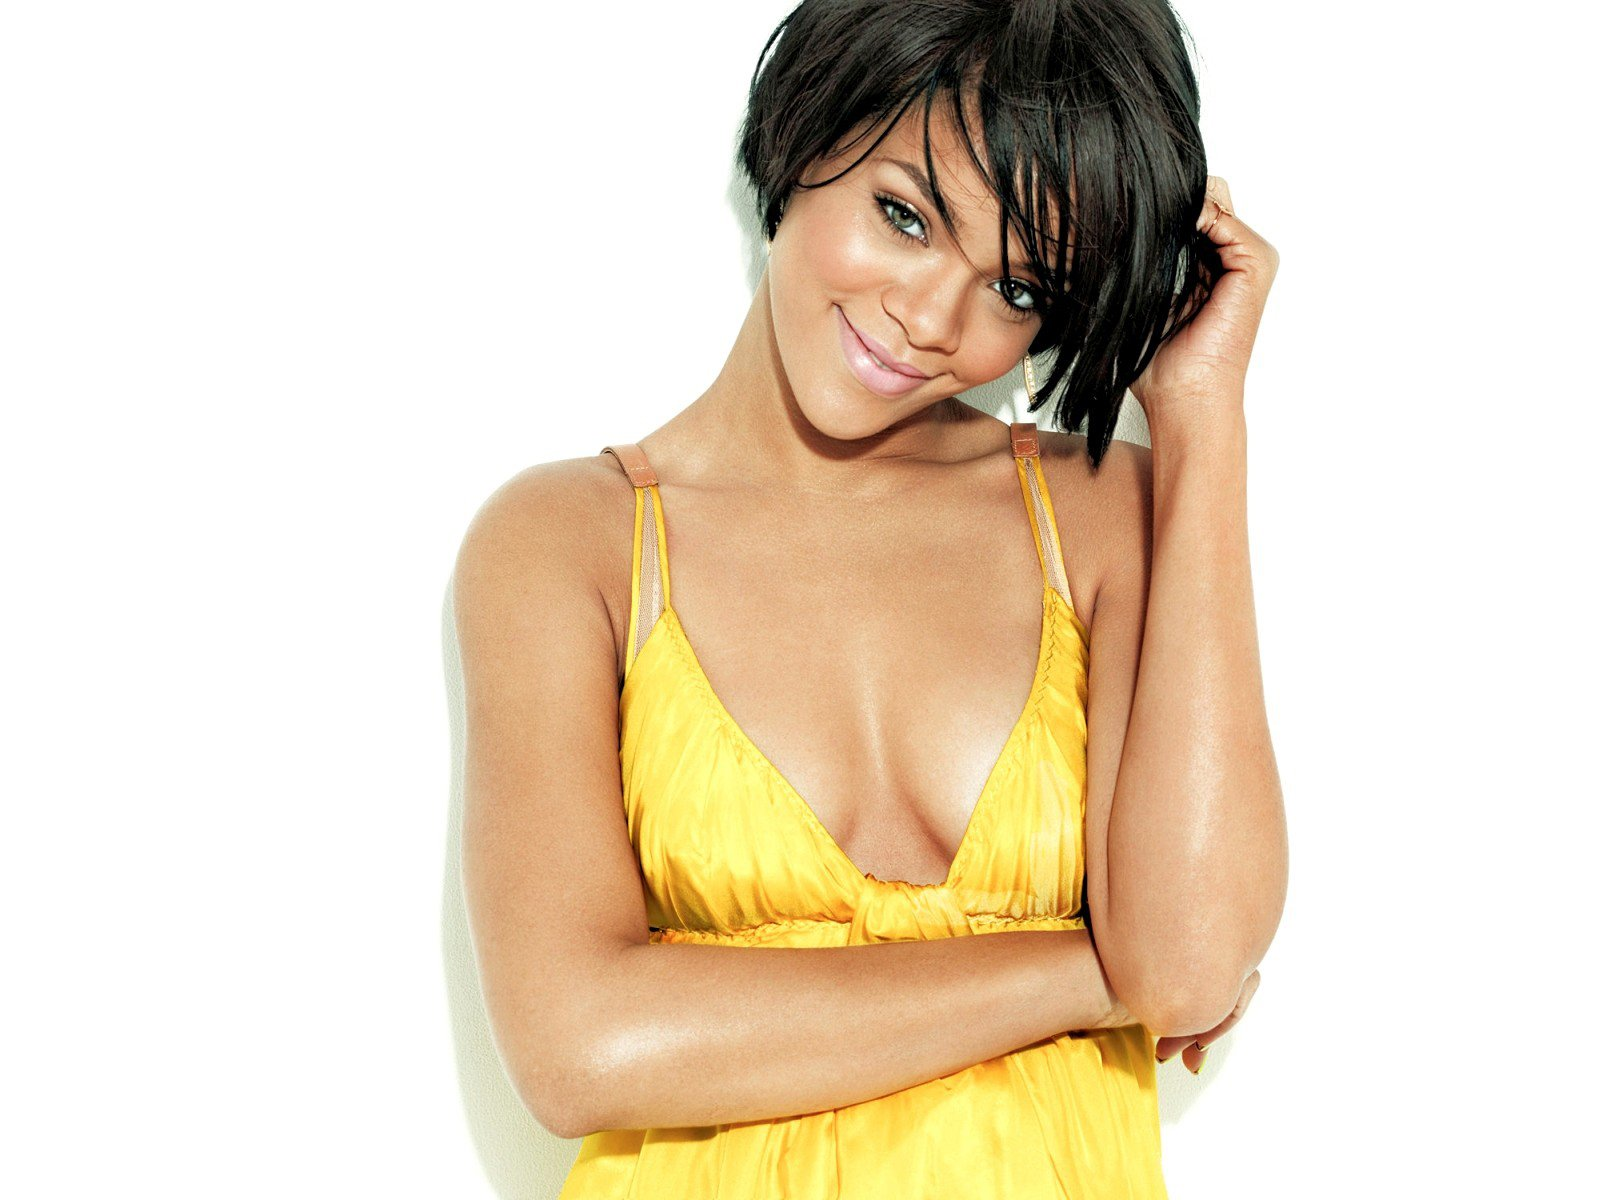 http://www.weesk.com/wallpaper/celebrites-femmes/rihanna/rihanna-51-rihanna-celebrites-femmes.jpg